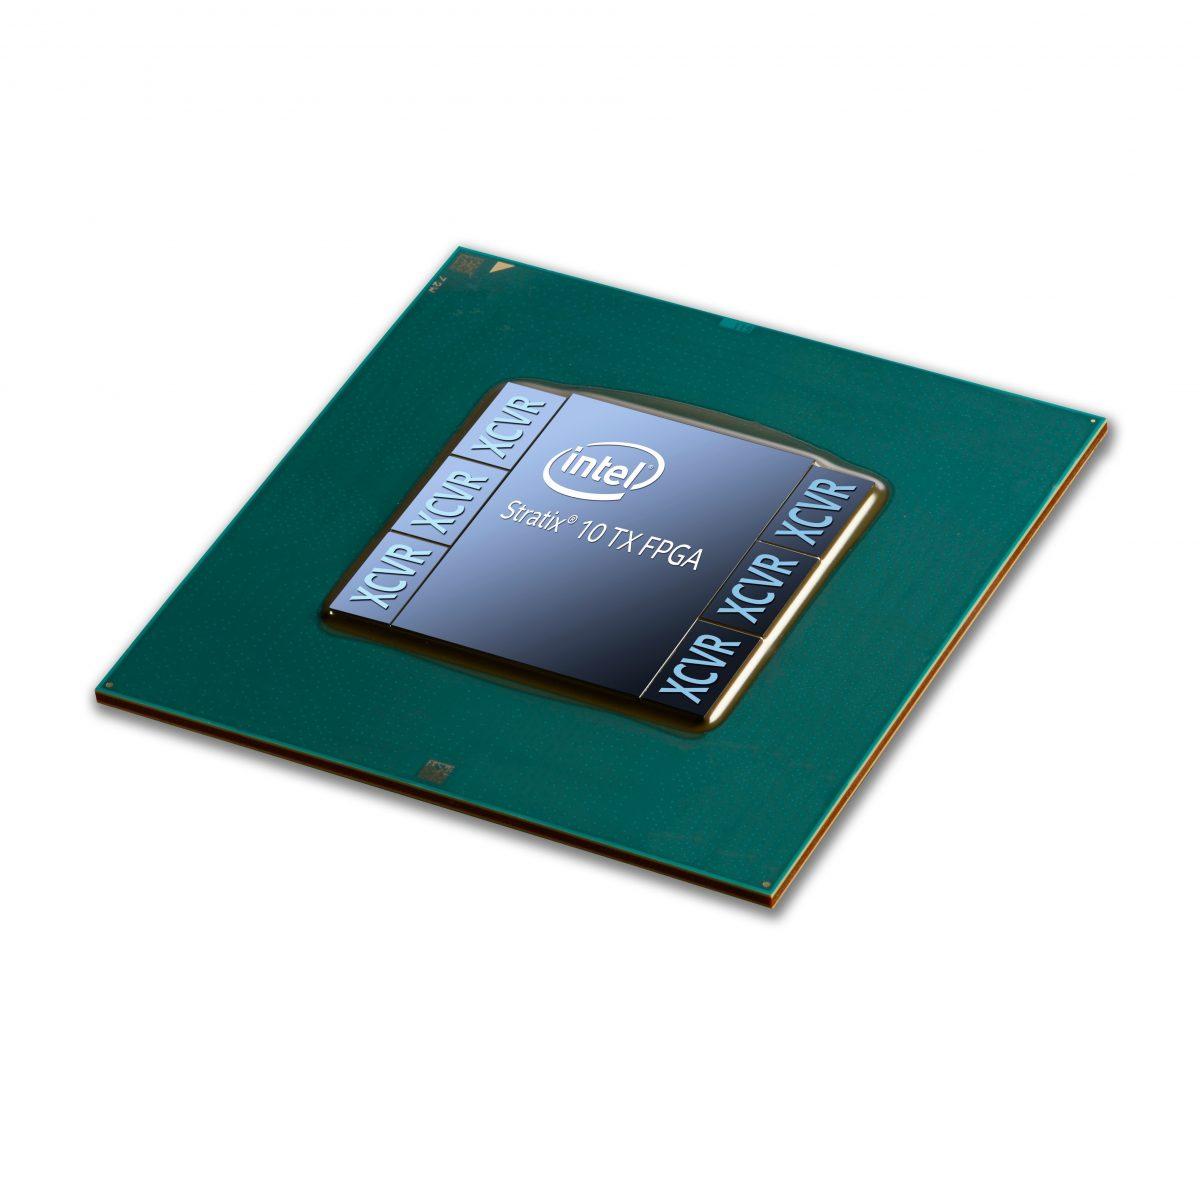 Intel FPGA Hits its Stride